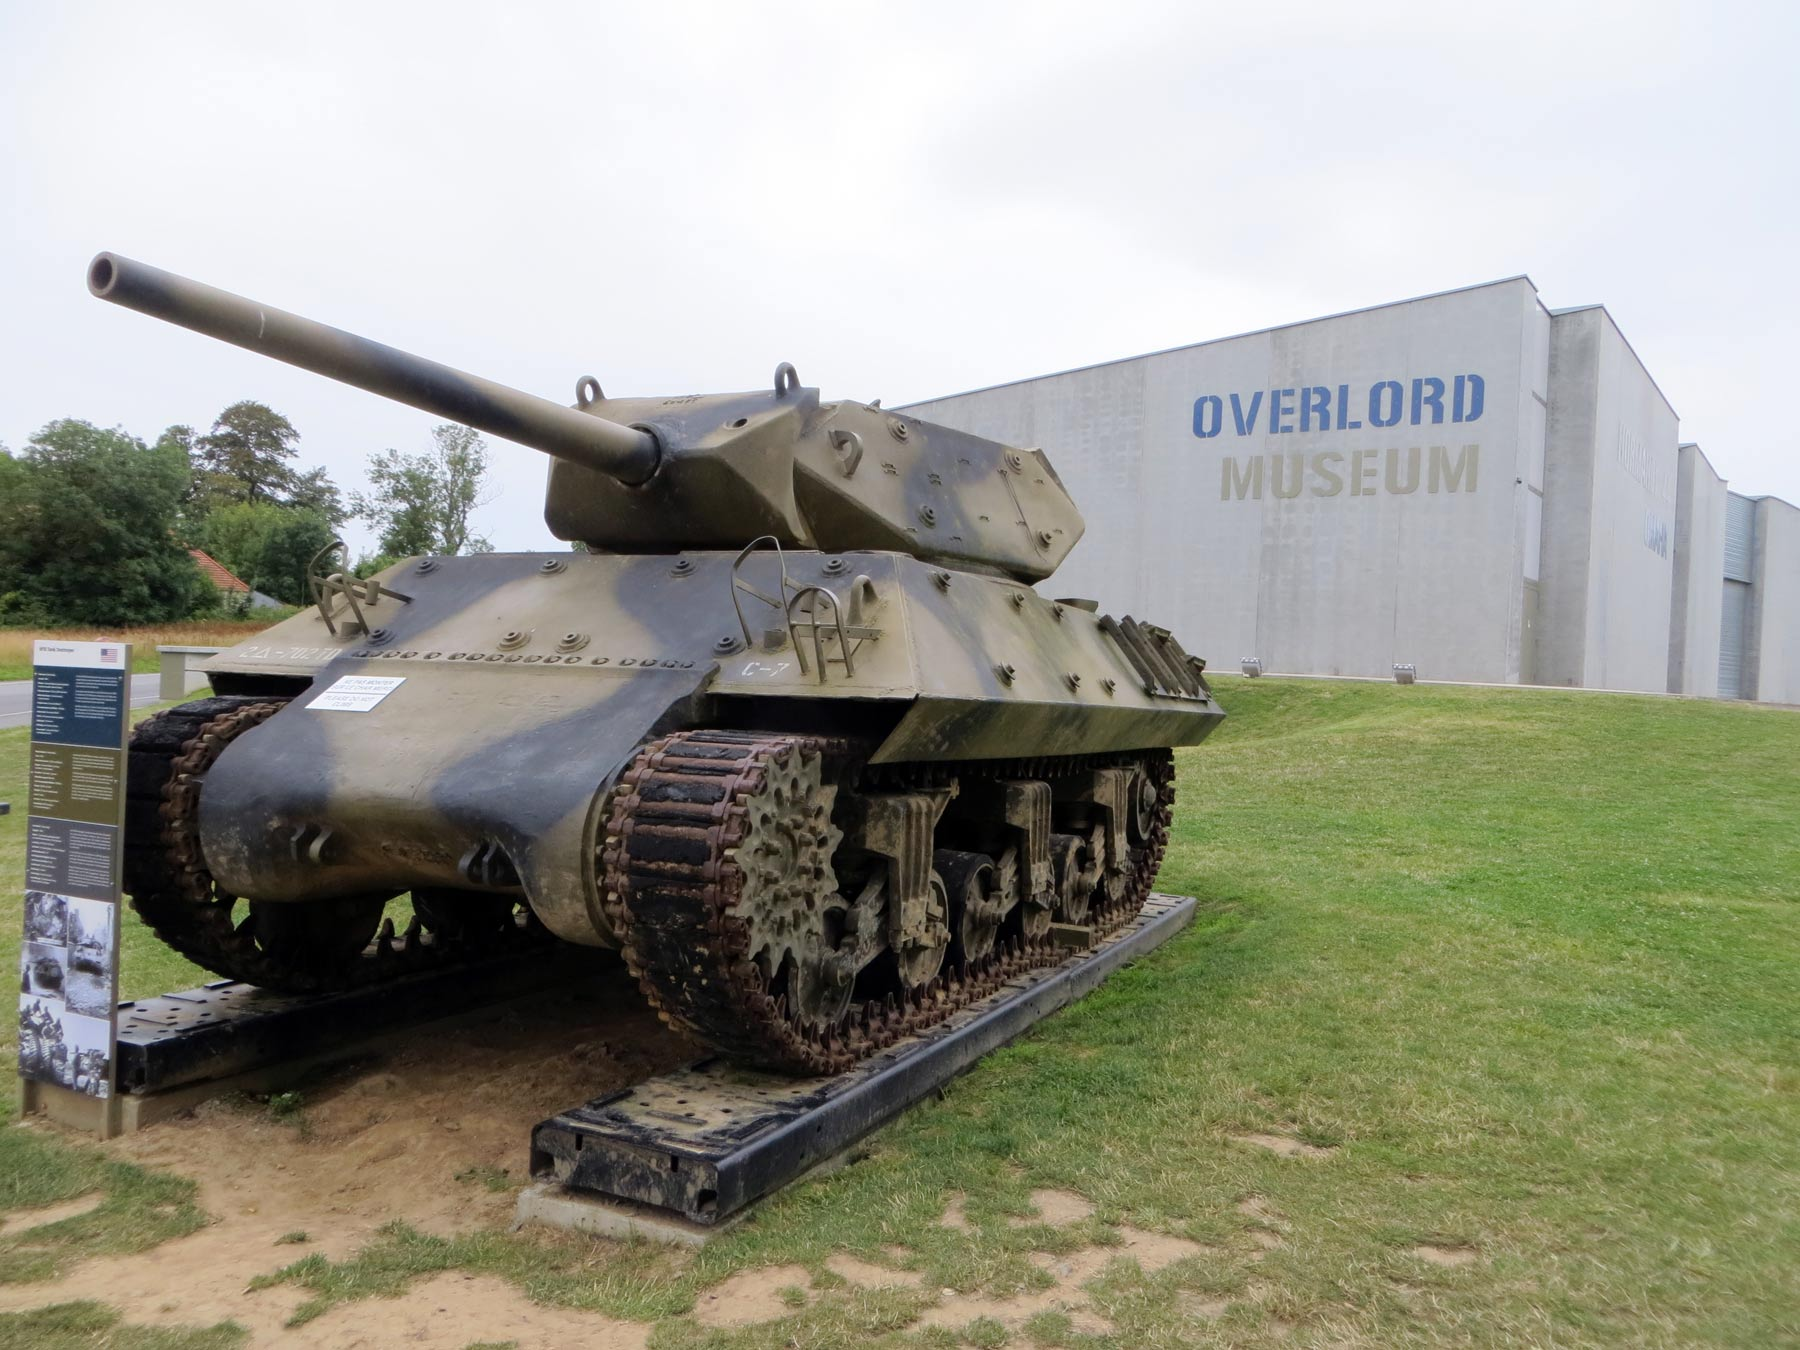 тур в Нормандию по местам сражений